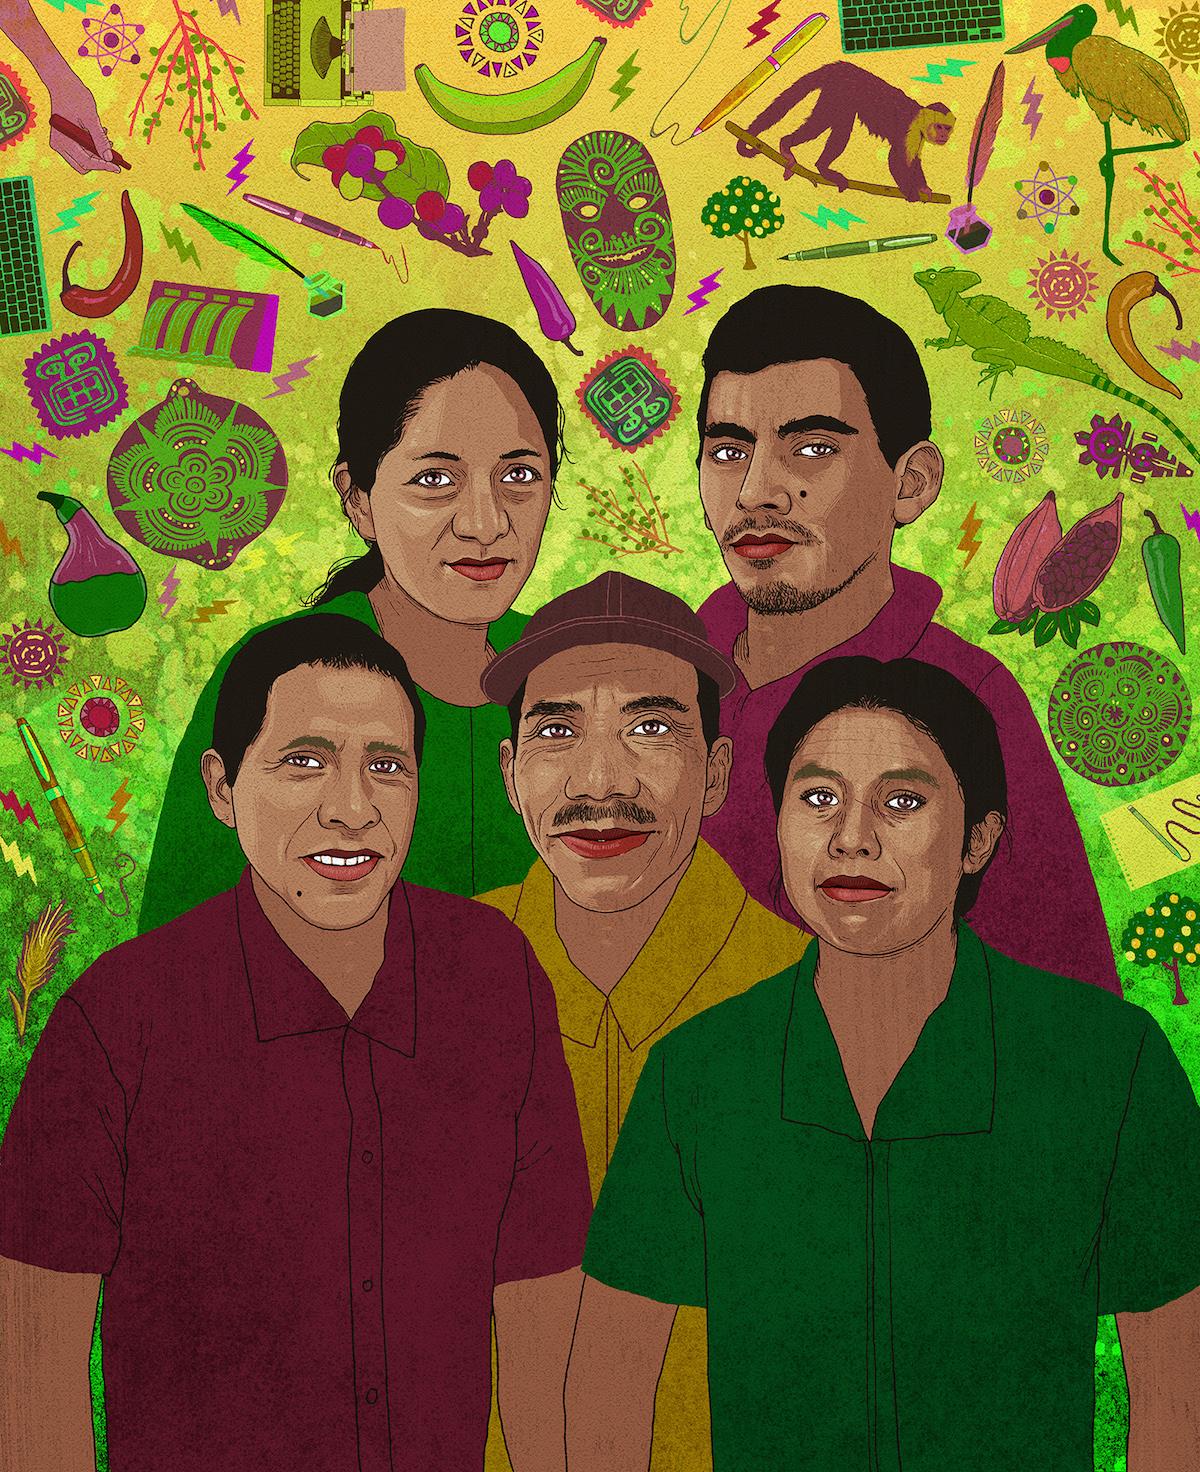 rebecca-hendin-amnesty-international-portrait-illustration-MILPAH-2-1200pixelswide